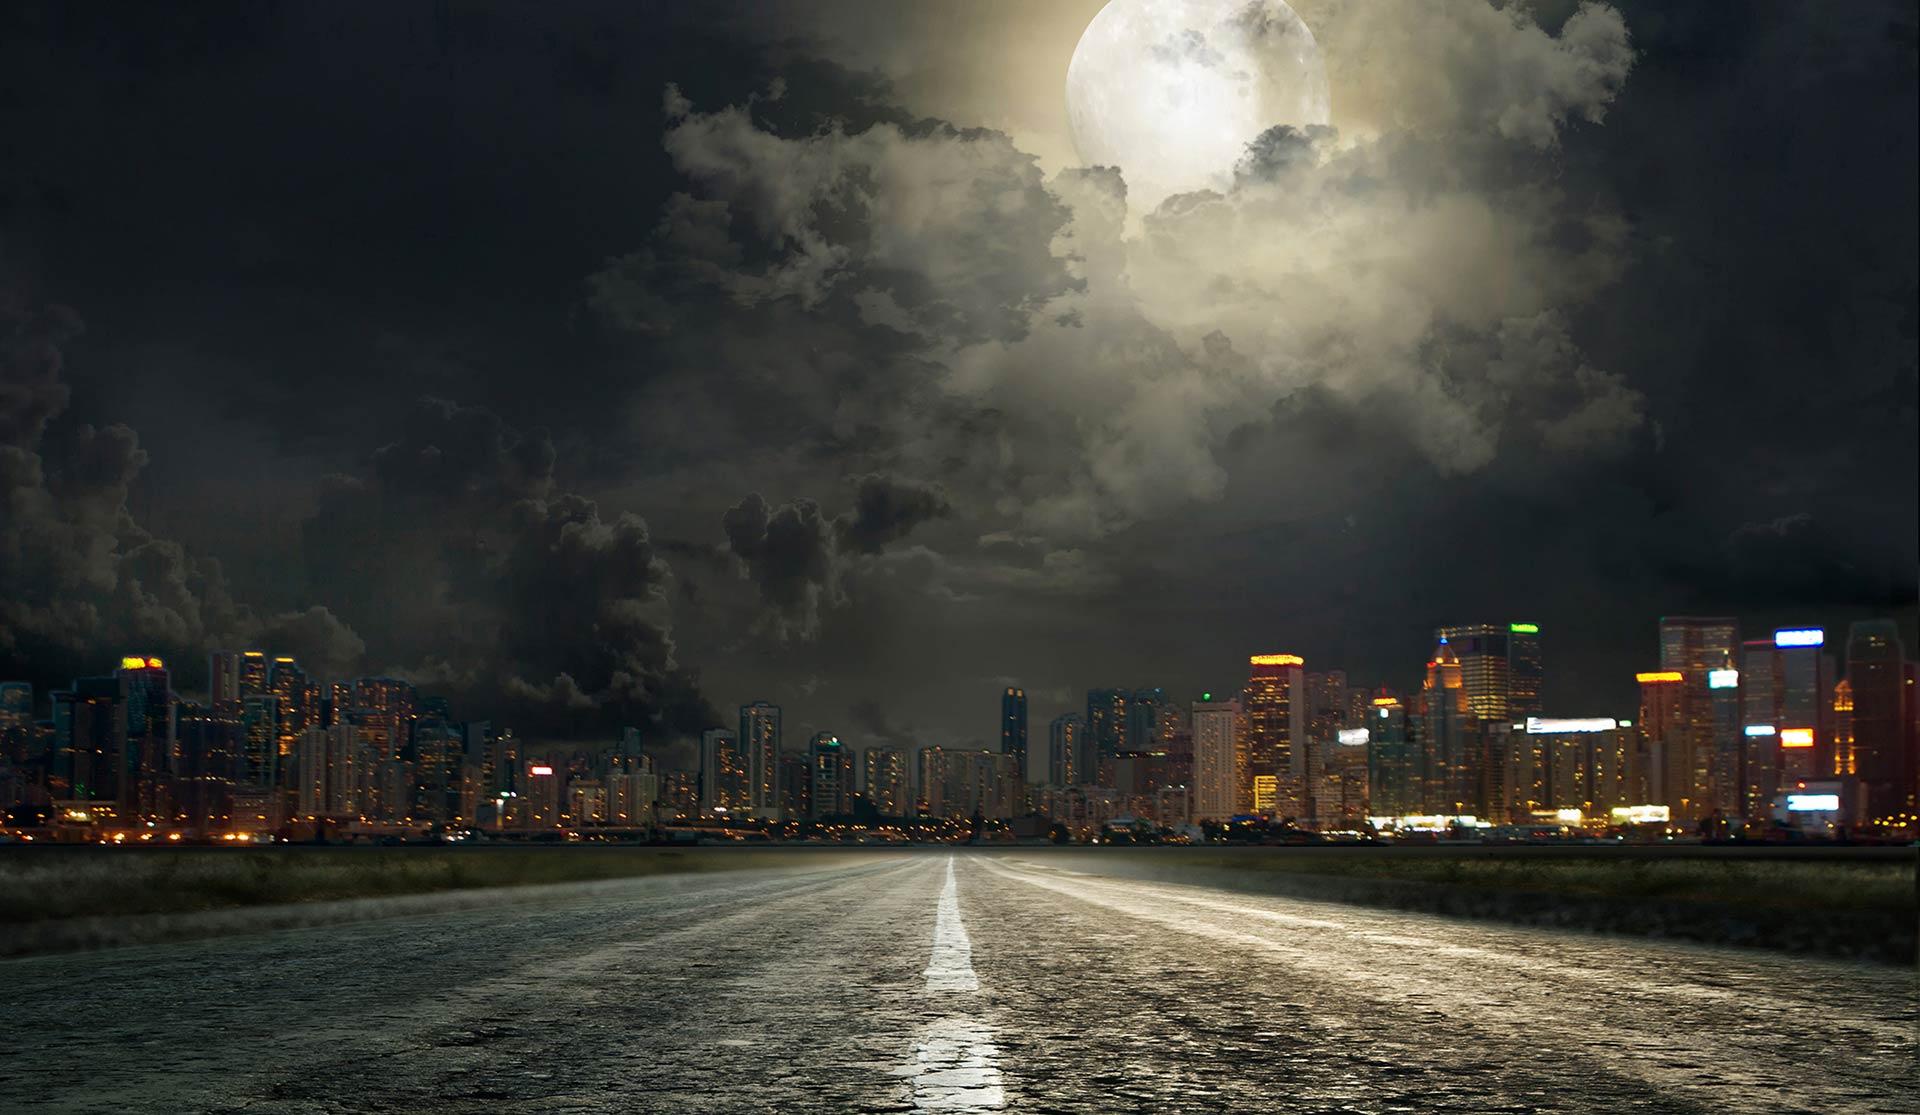 Night Road Yocter